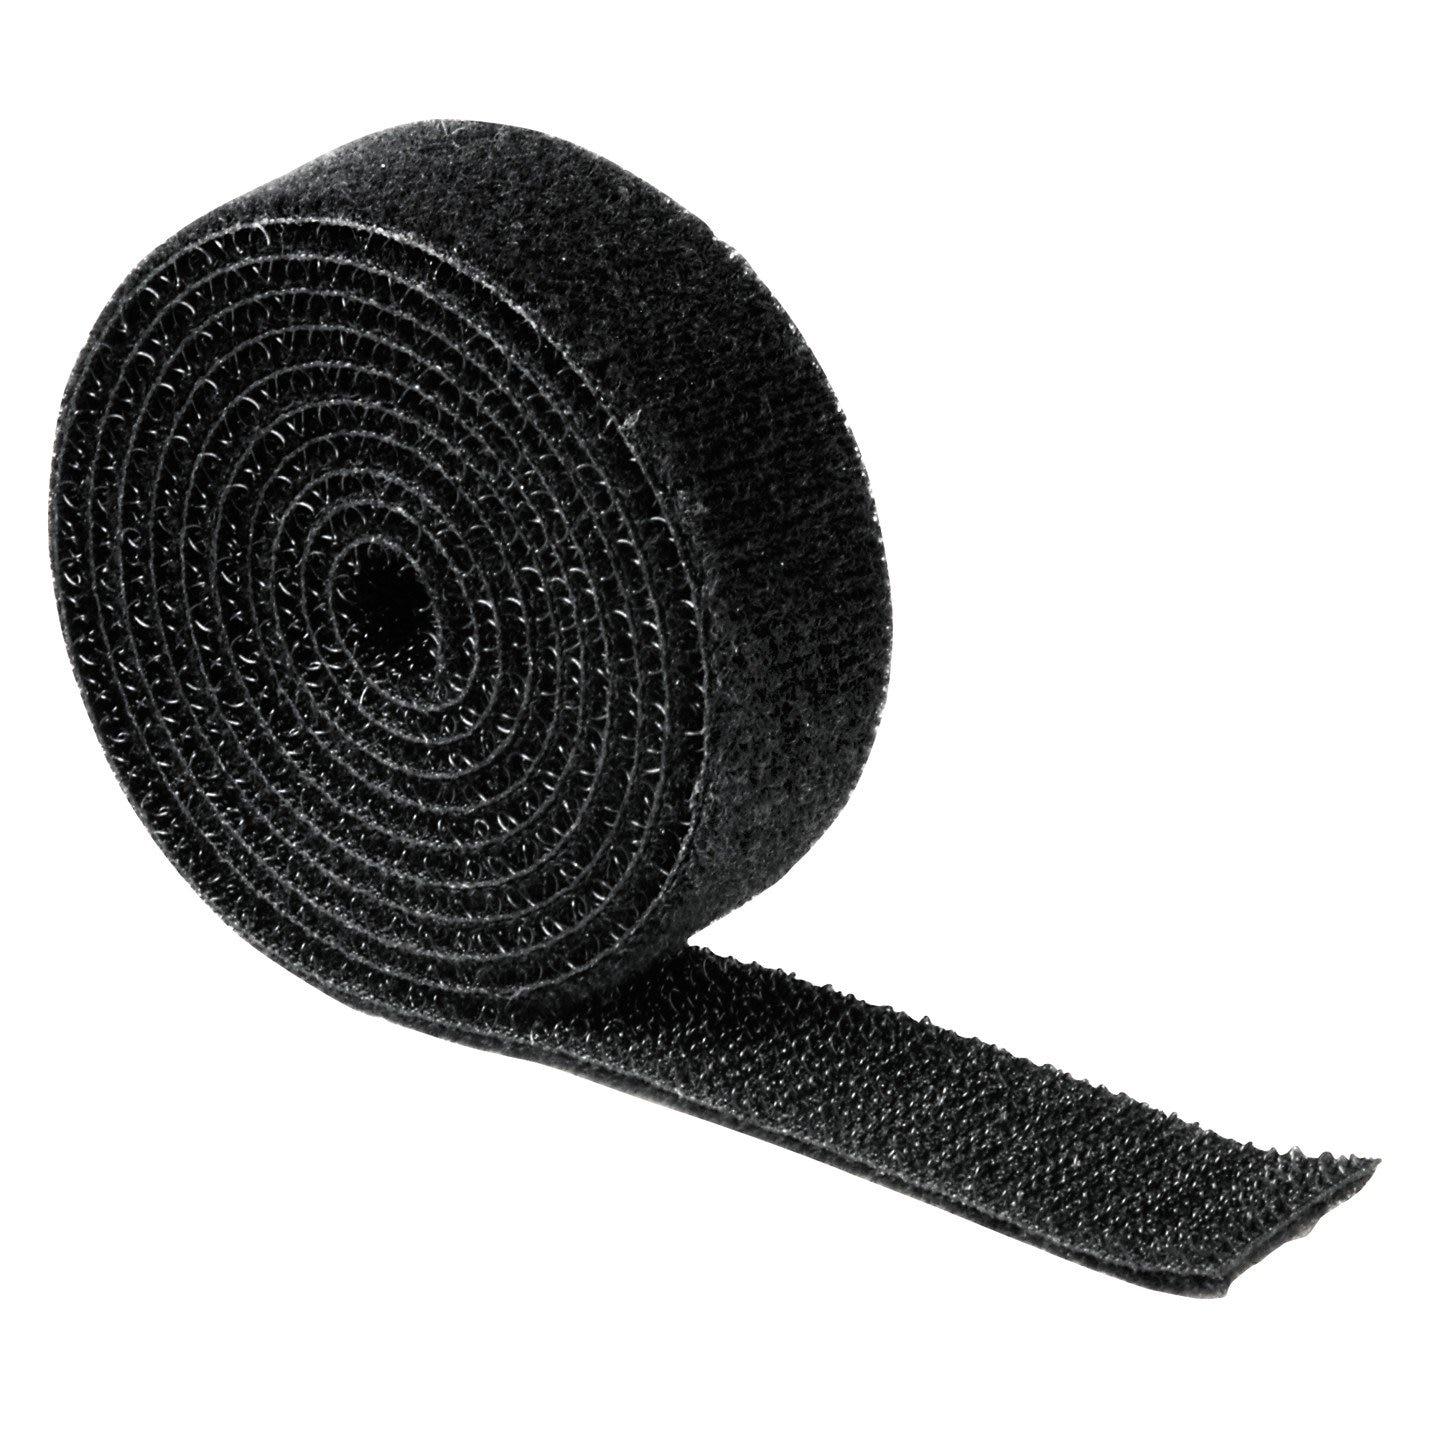 "Rip-Tie Cable Catch Organizers Bag of 1/"" x 2/"" 5 C-02-005-BK - Black"